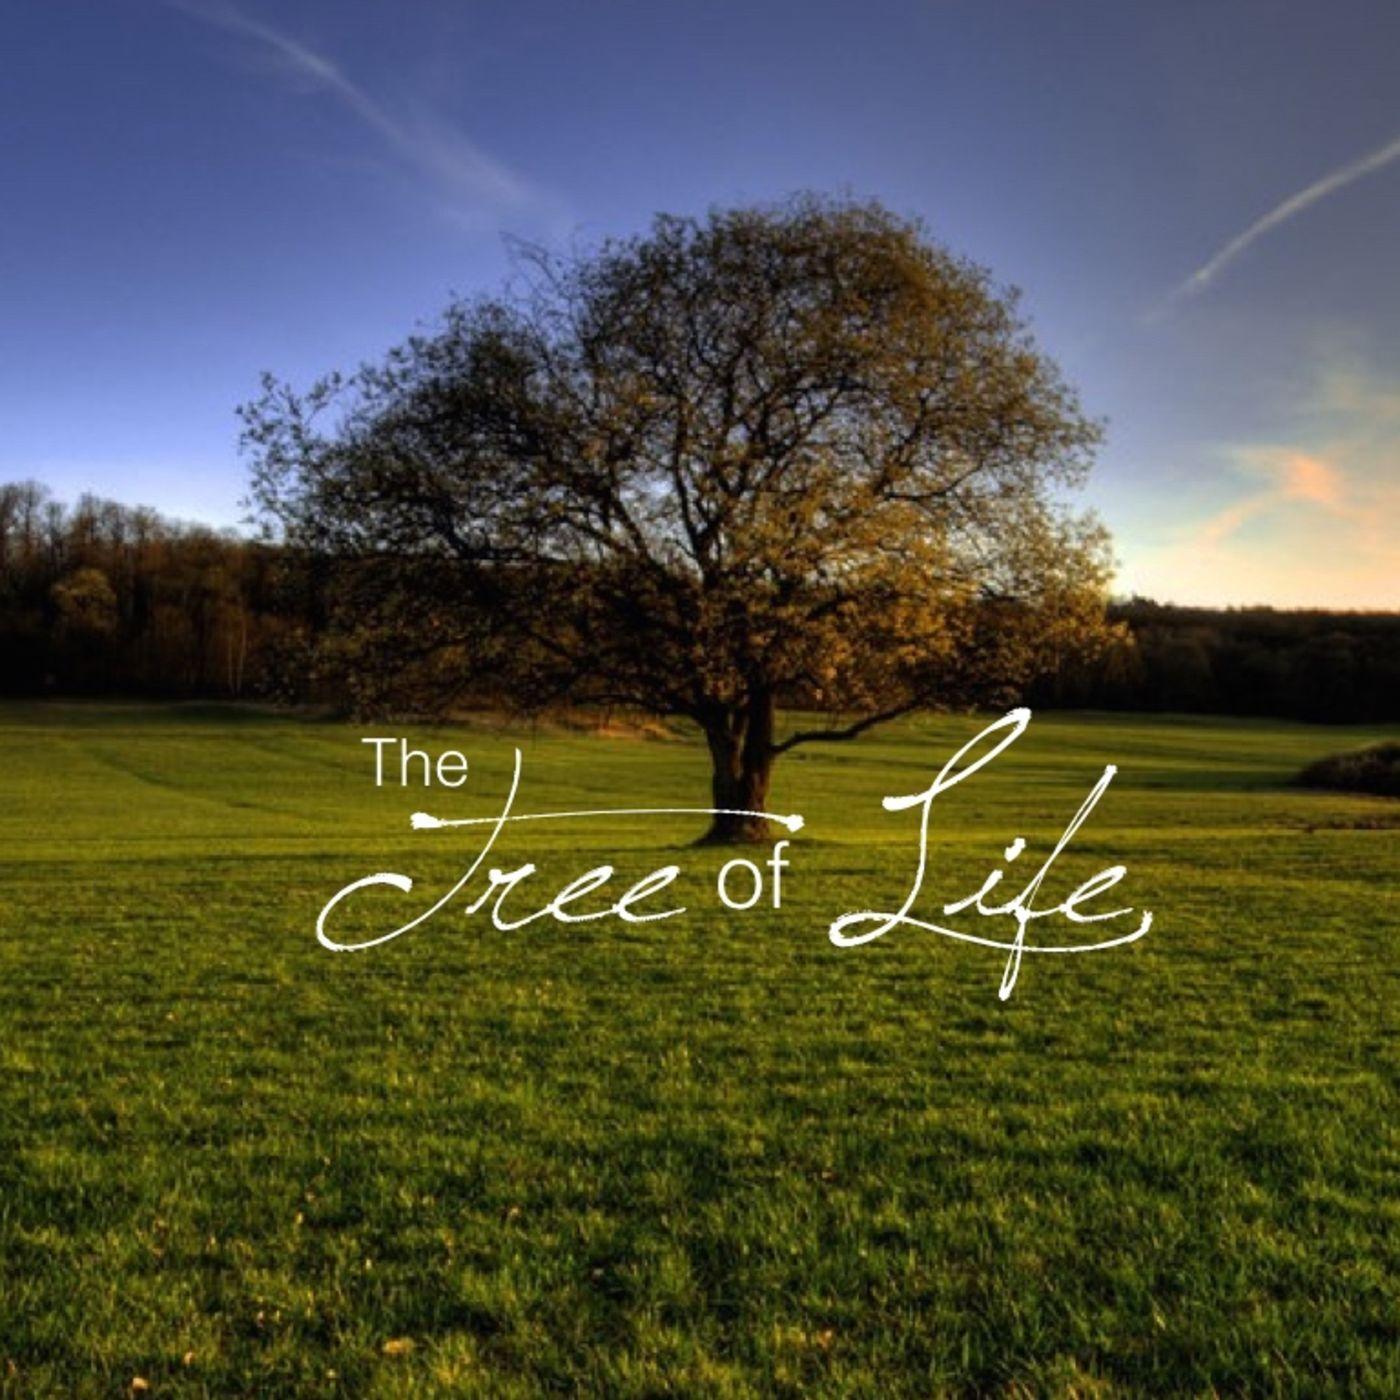 christian life austin the tree of life